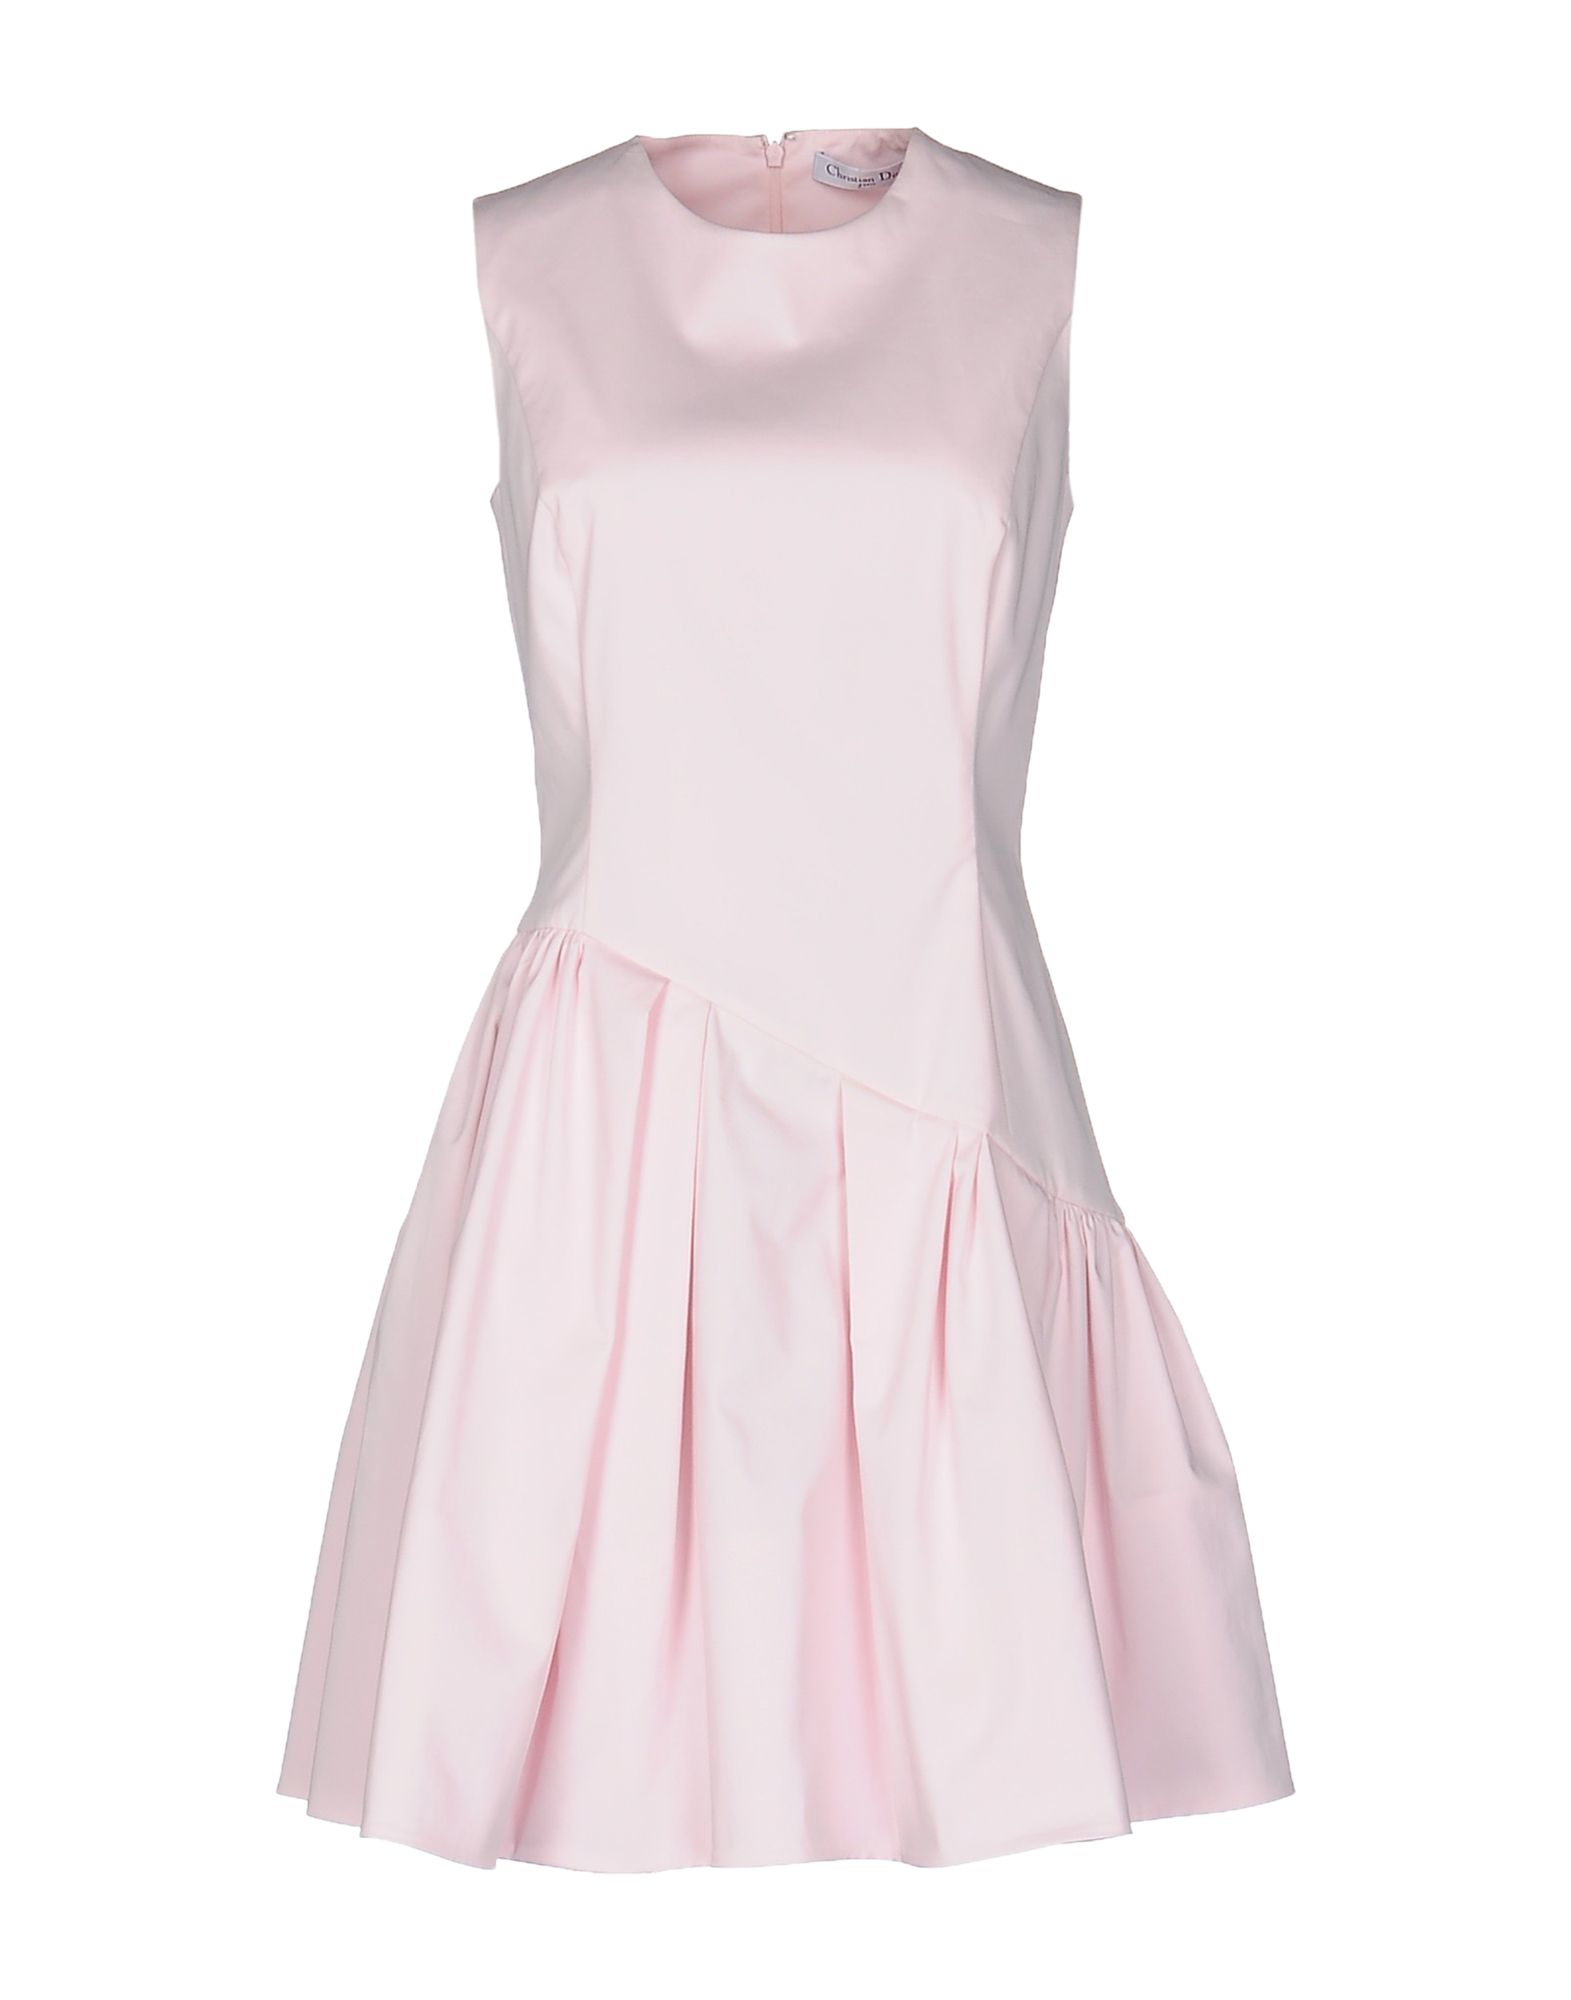 dior short dresses - photo #42